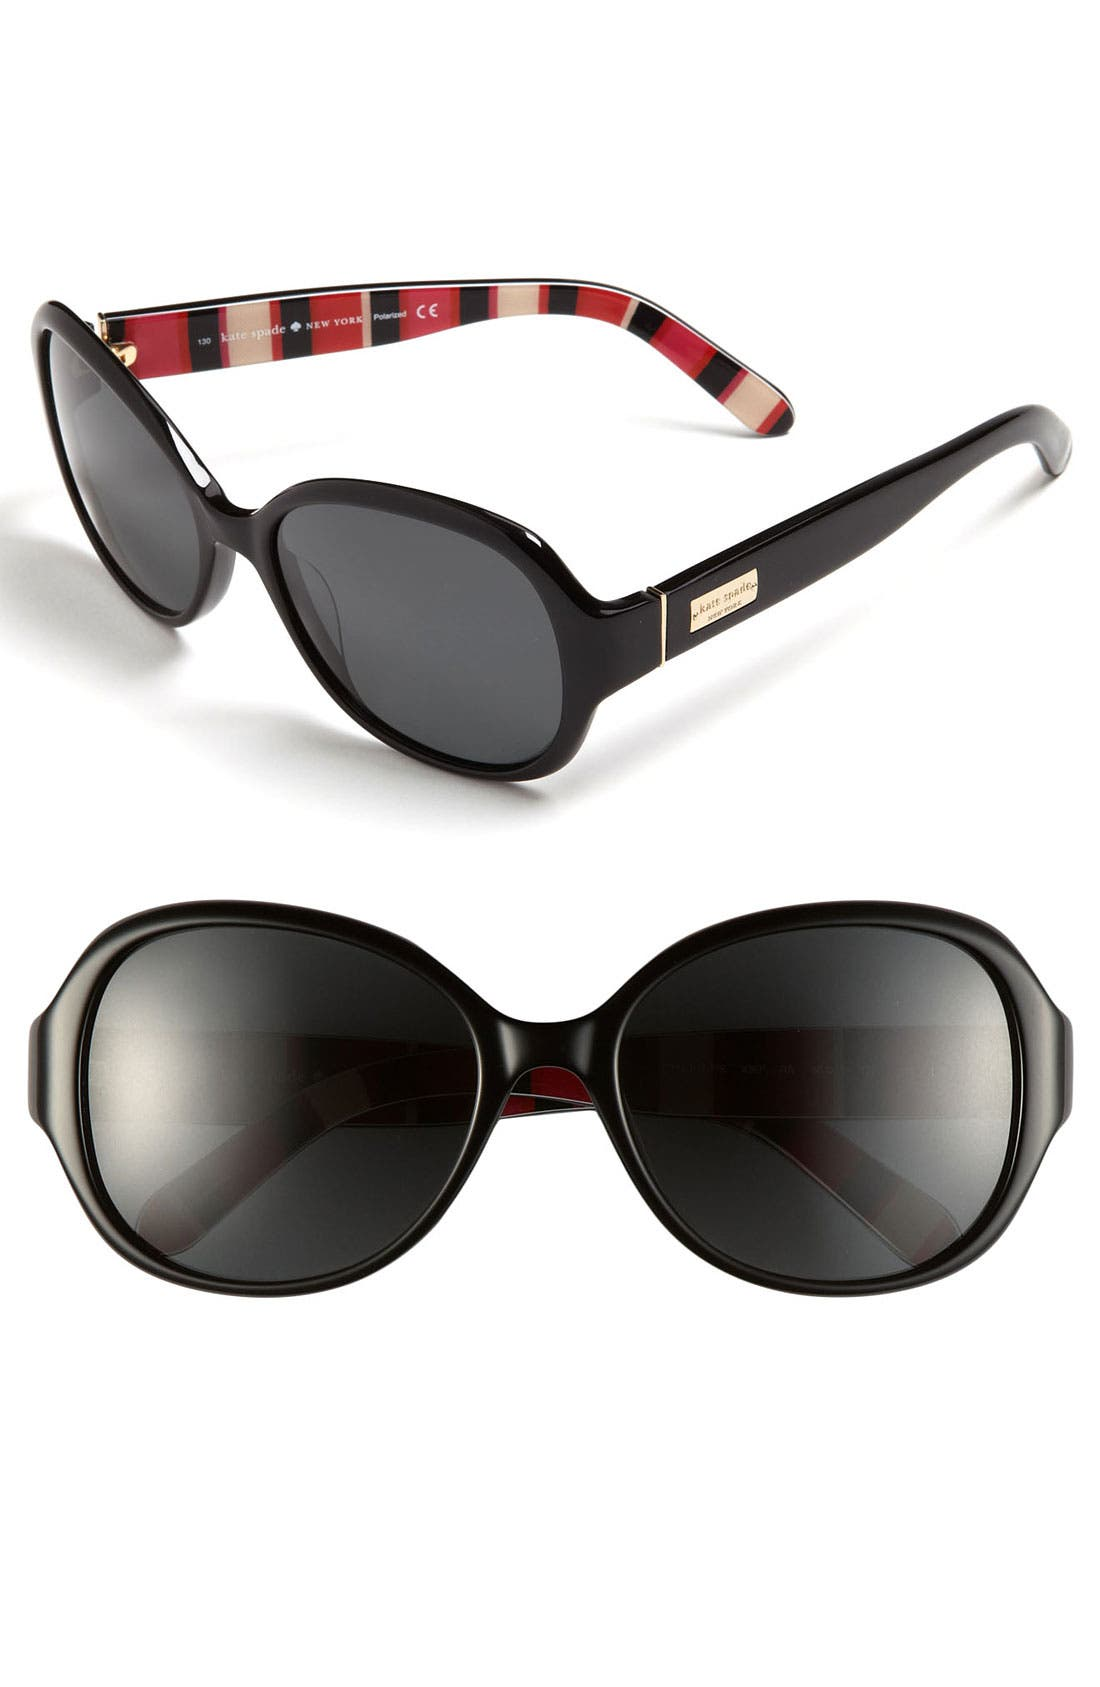 Alternate Image 1 Selected - kate spade new york 'cymone' 55mm polarized sunglasses